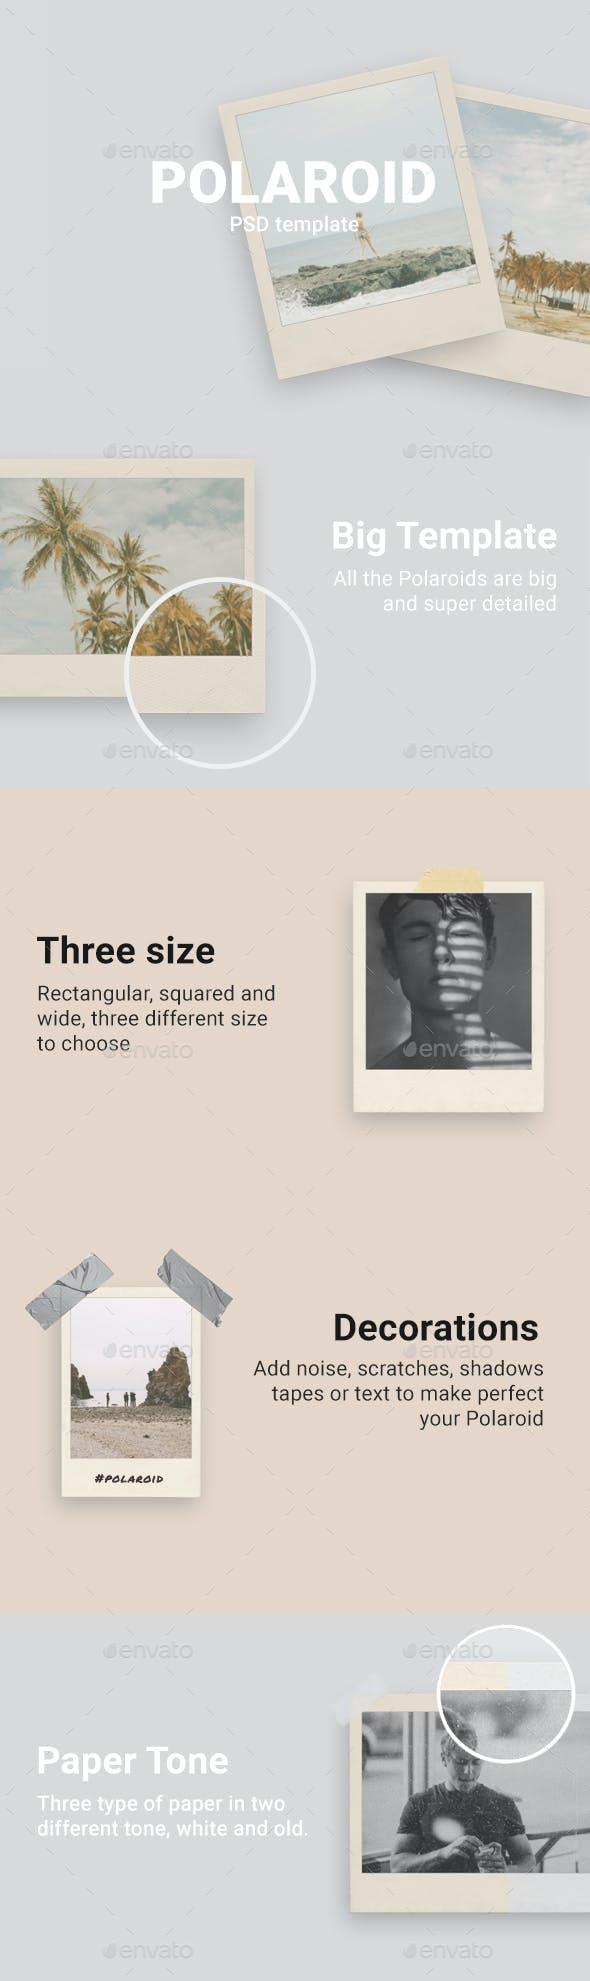 polaroid template by ragestudio graphicriver